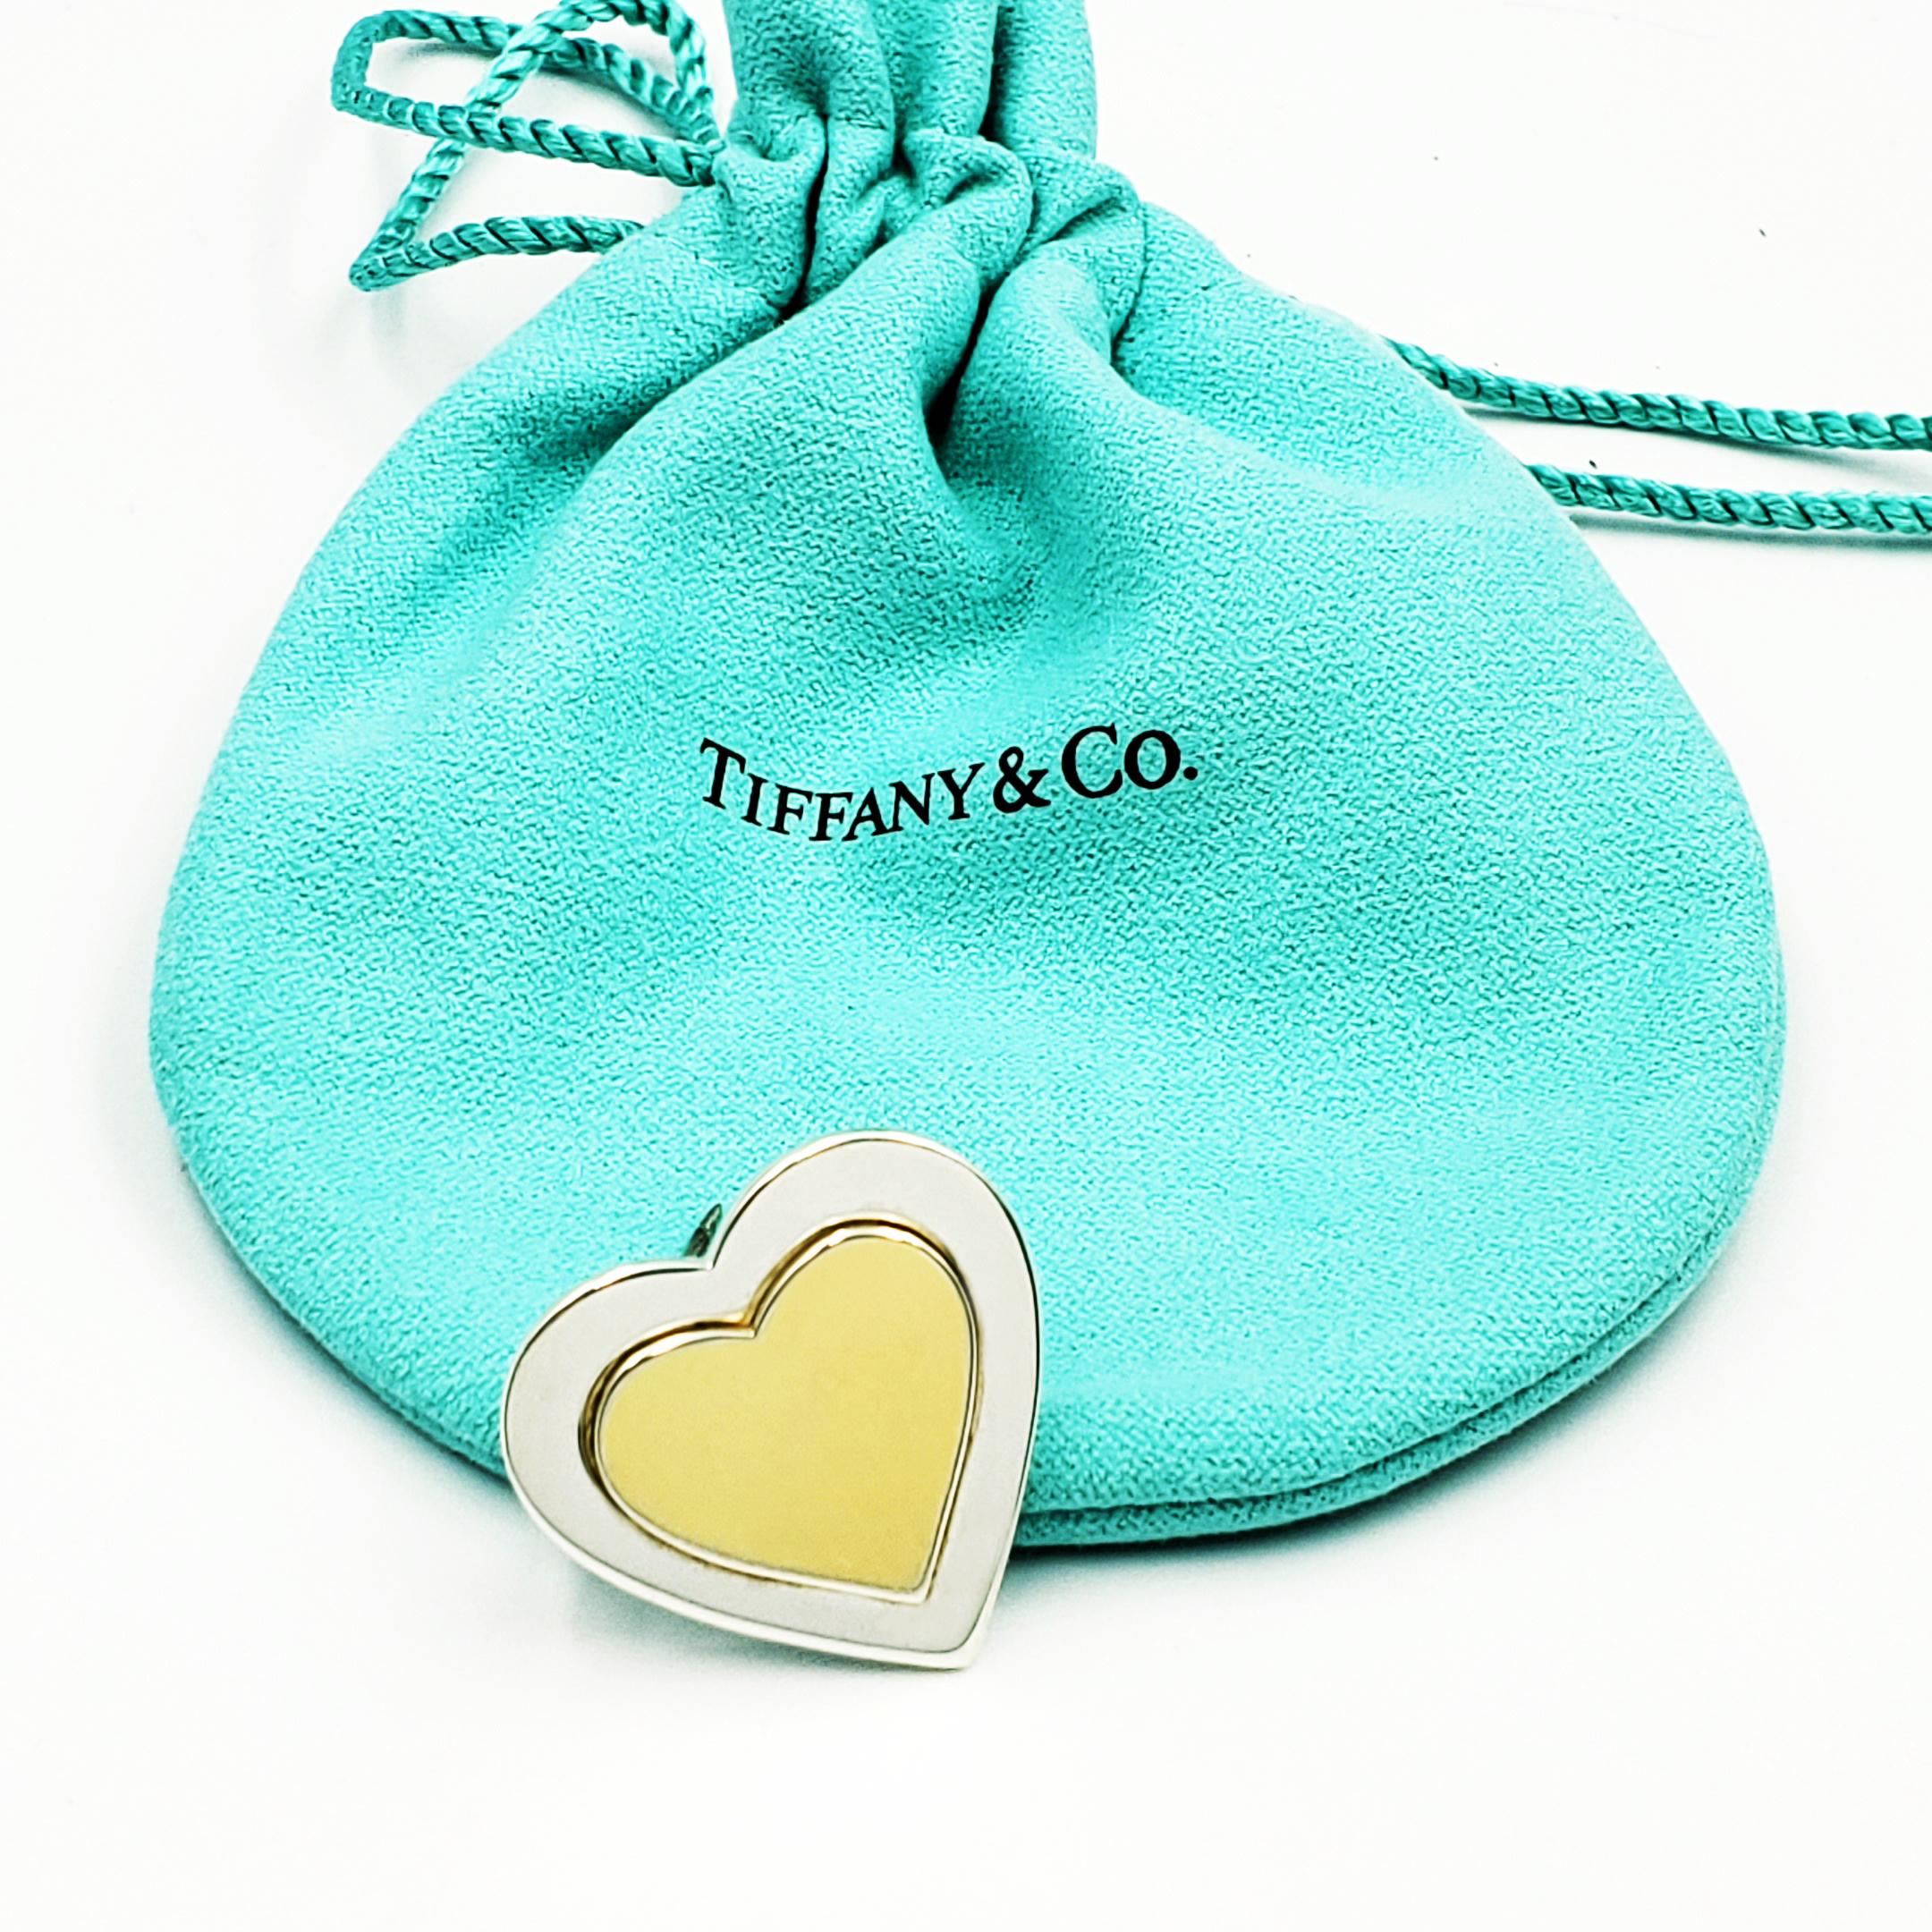 <b>Tiffany & Co.</b><br> Vintage 925 Sterling Silver & 18Karat Yellow Gold Inlay Heart Pin Broach